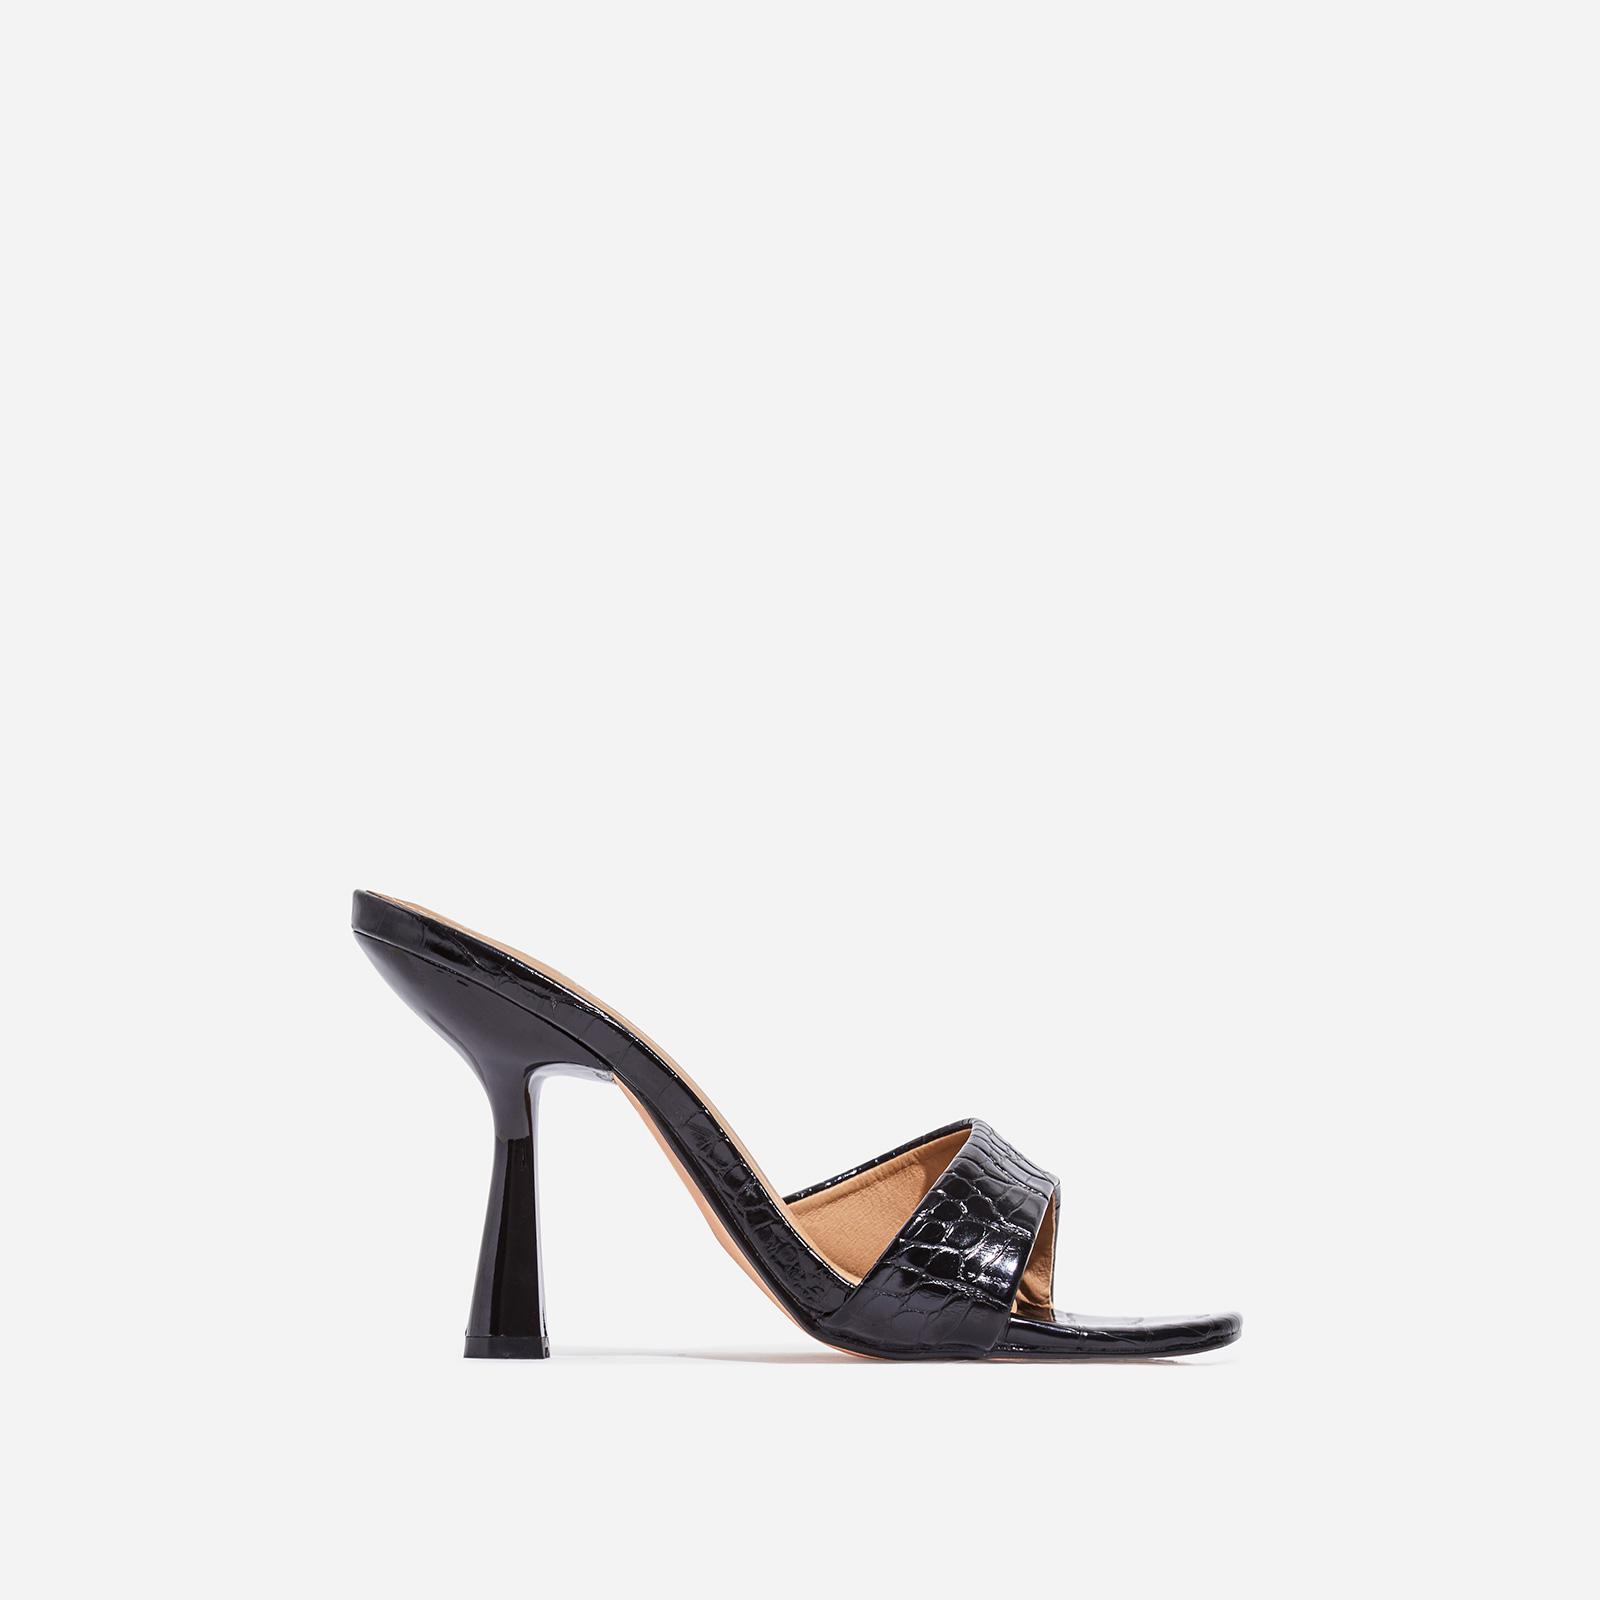 Found Square Peep Toe Heel Mule In Black Croc Print Faux Leather